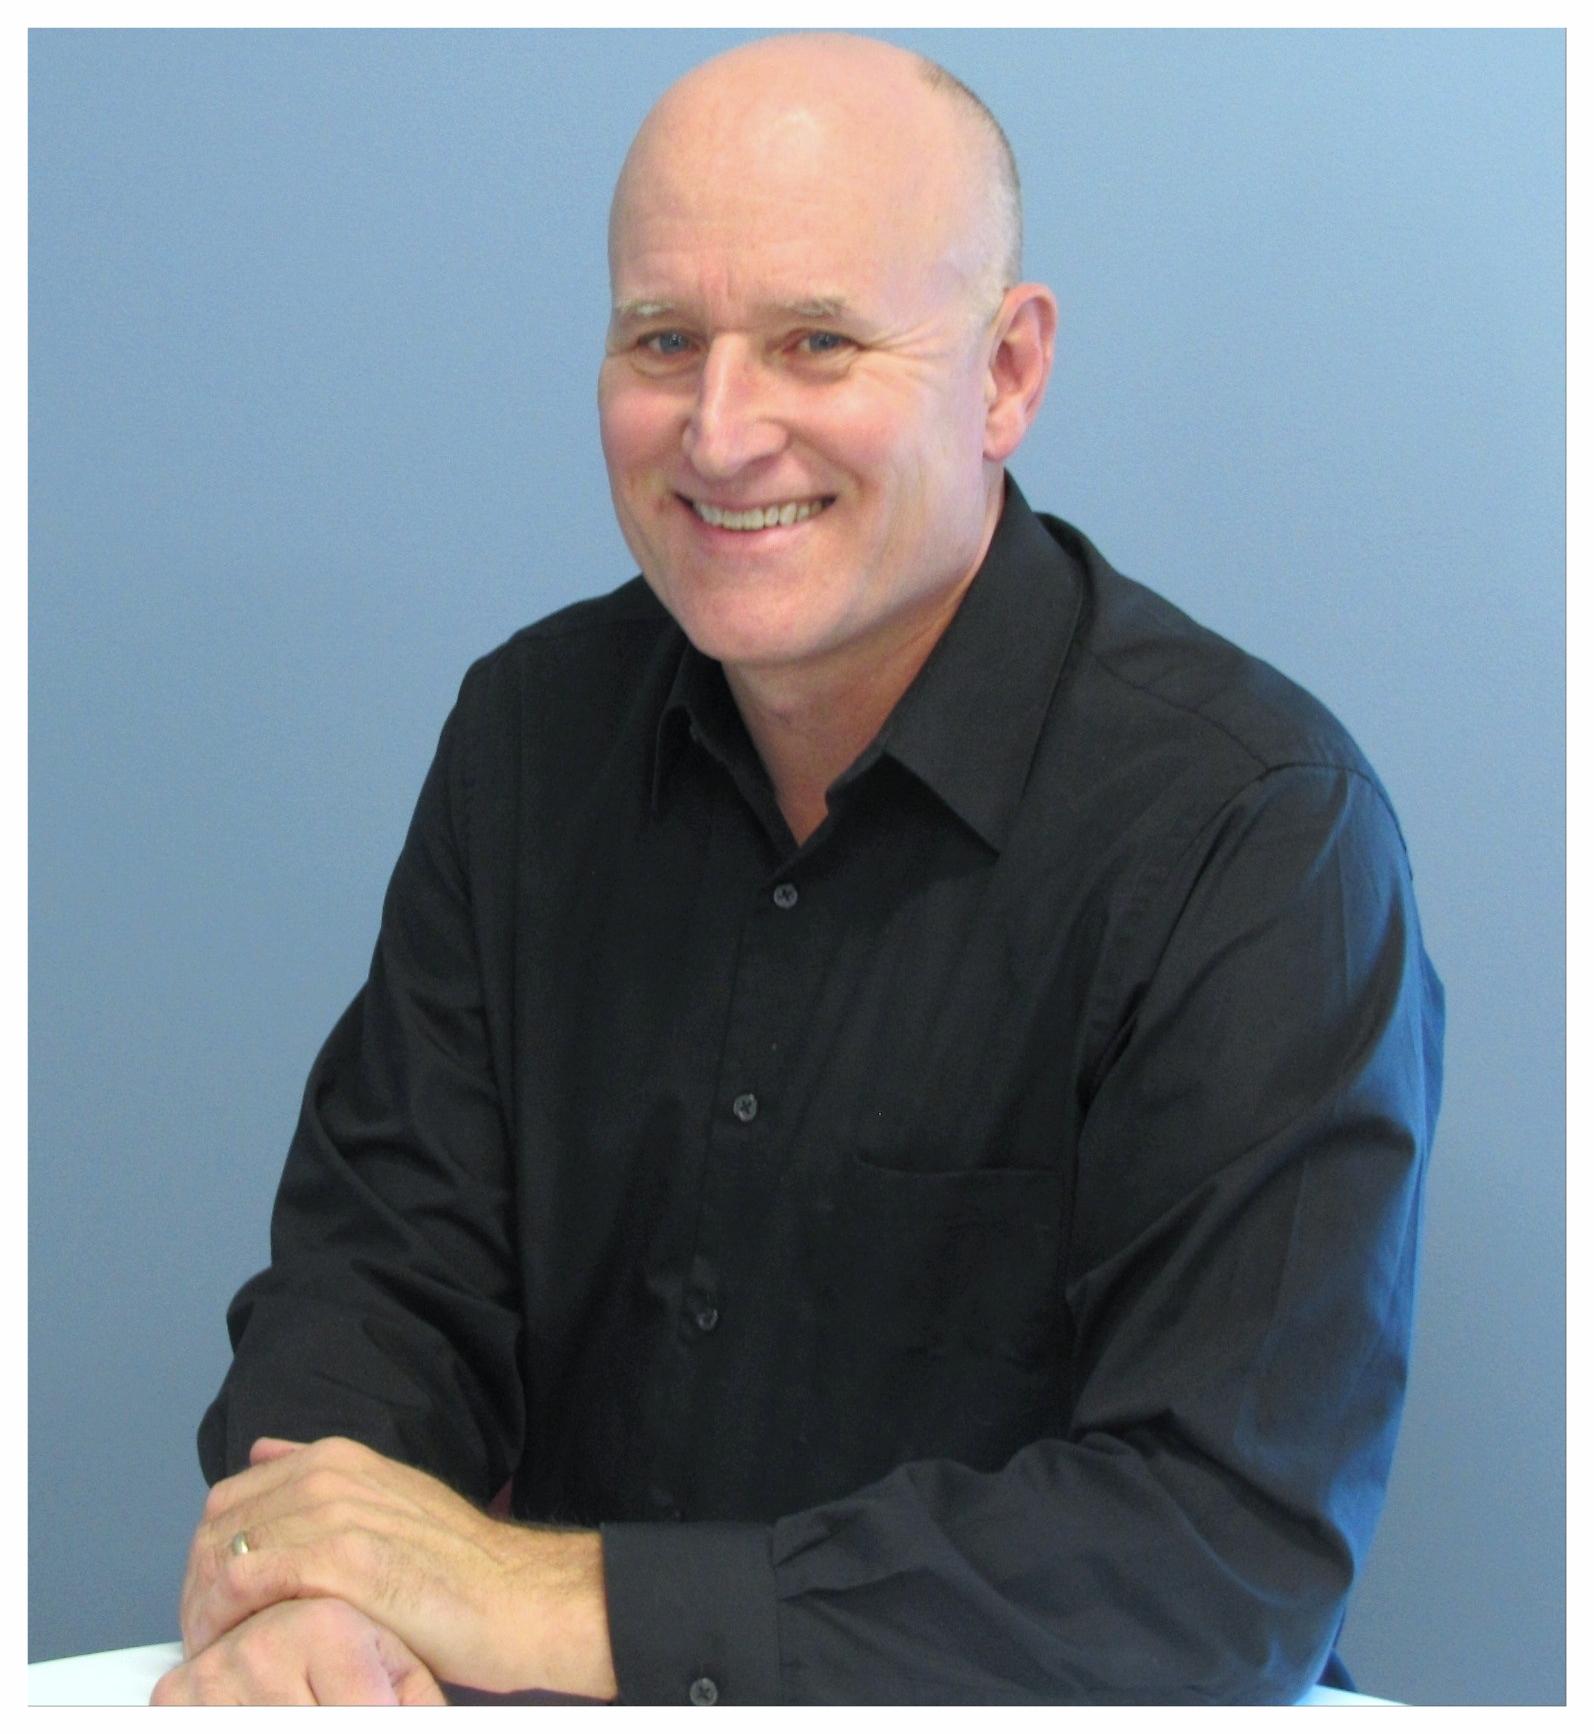 John L. Wheaton - CEO and PresidentWHEATON SPRAGUE BUILDING ENVELOPE